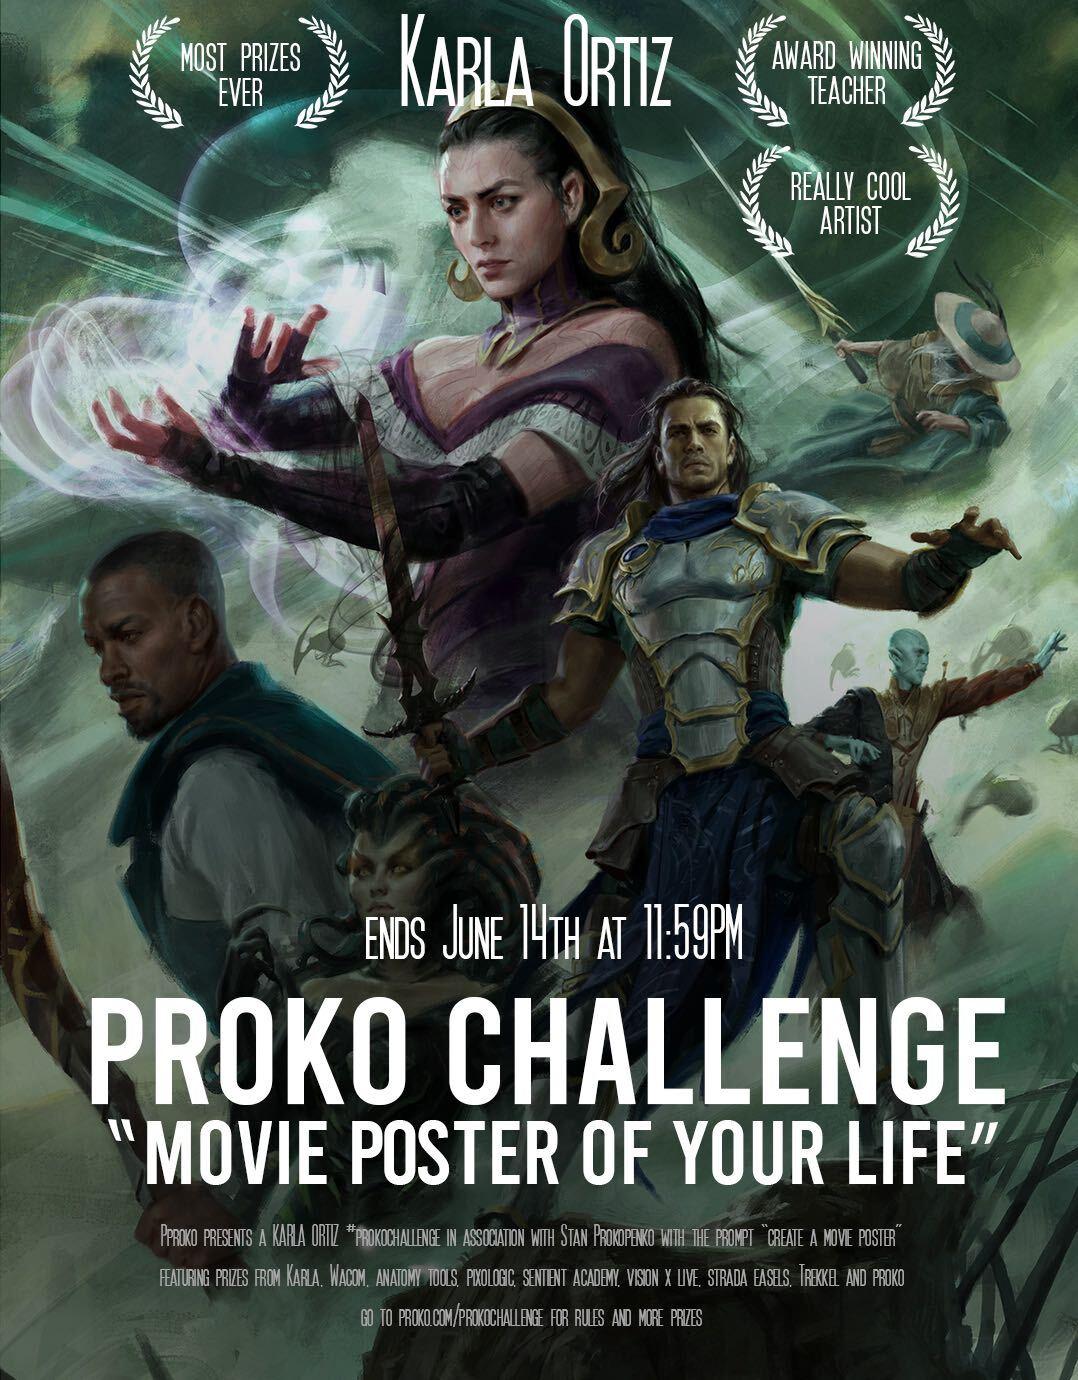 Karla Ortiz Movie Poster Proko Challenge